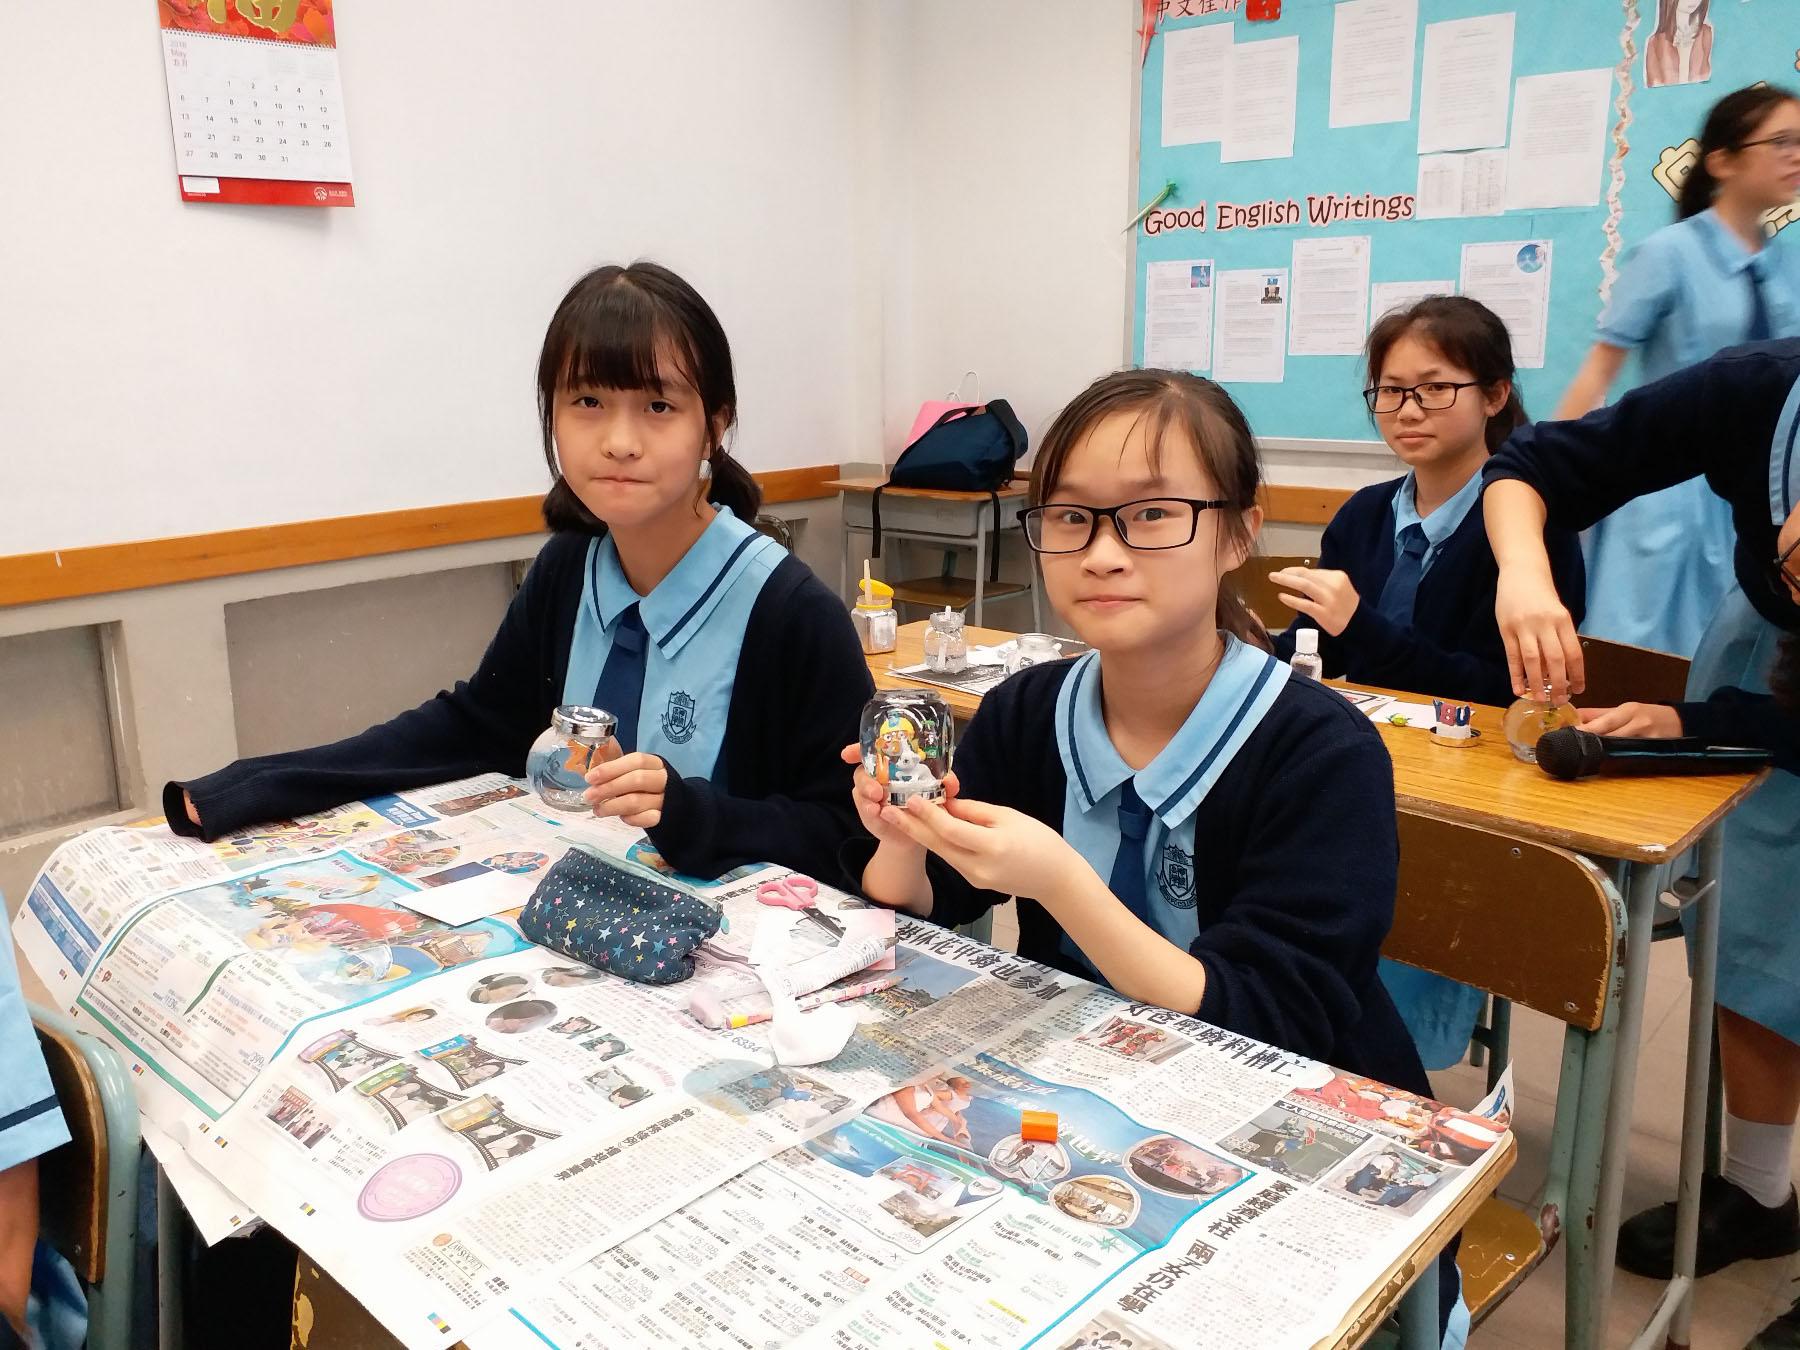 http://www.npc.edu.hk/sites/default/files/20180511_170325.jpg